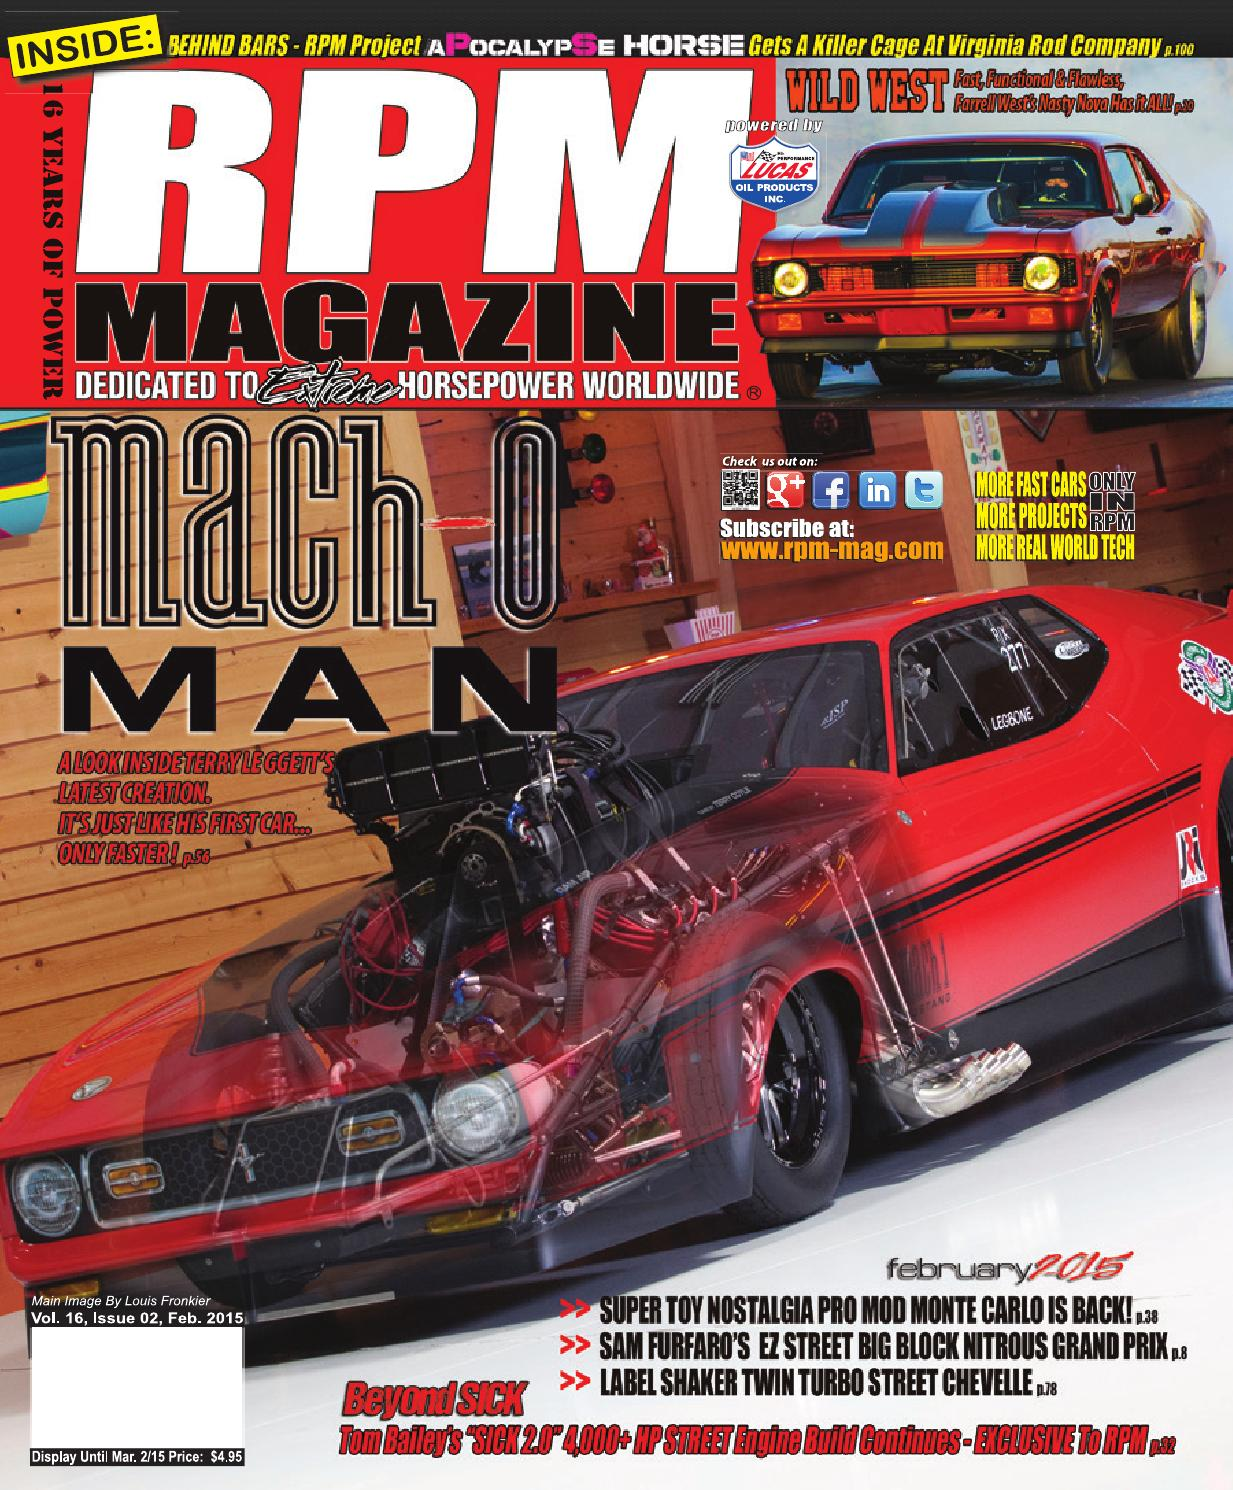 RPM Magazine February issue 2015 by RPM Magazine - issuu